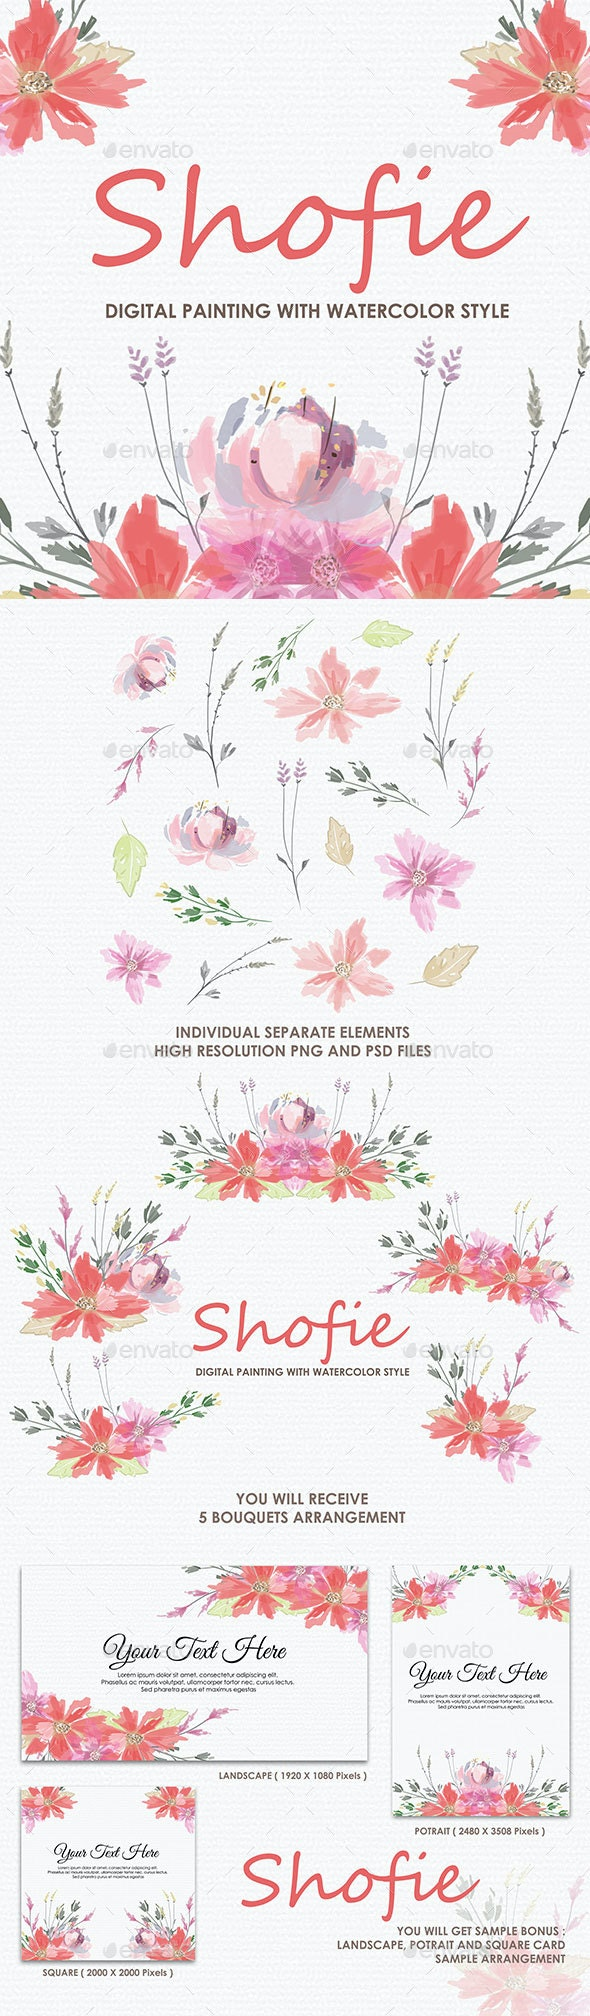 Shofie - Watercolor Digital Painting Floral Flowers Style - Decorative Graphics